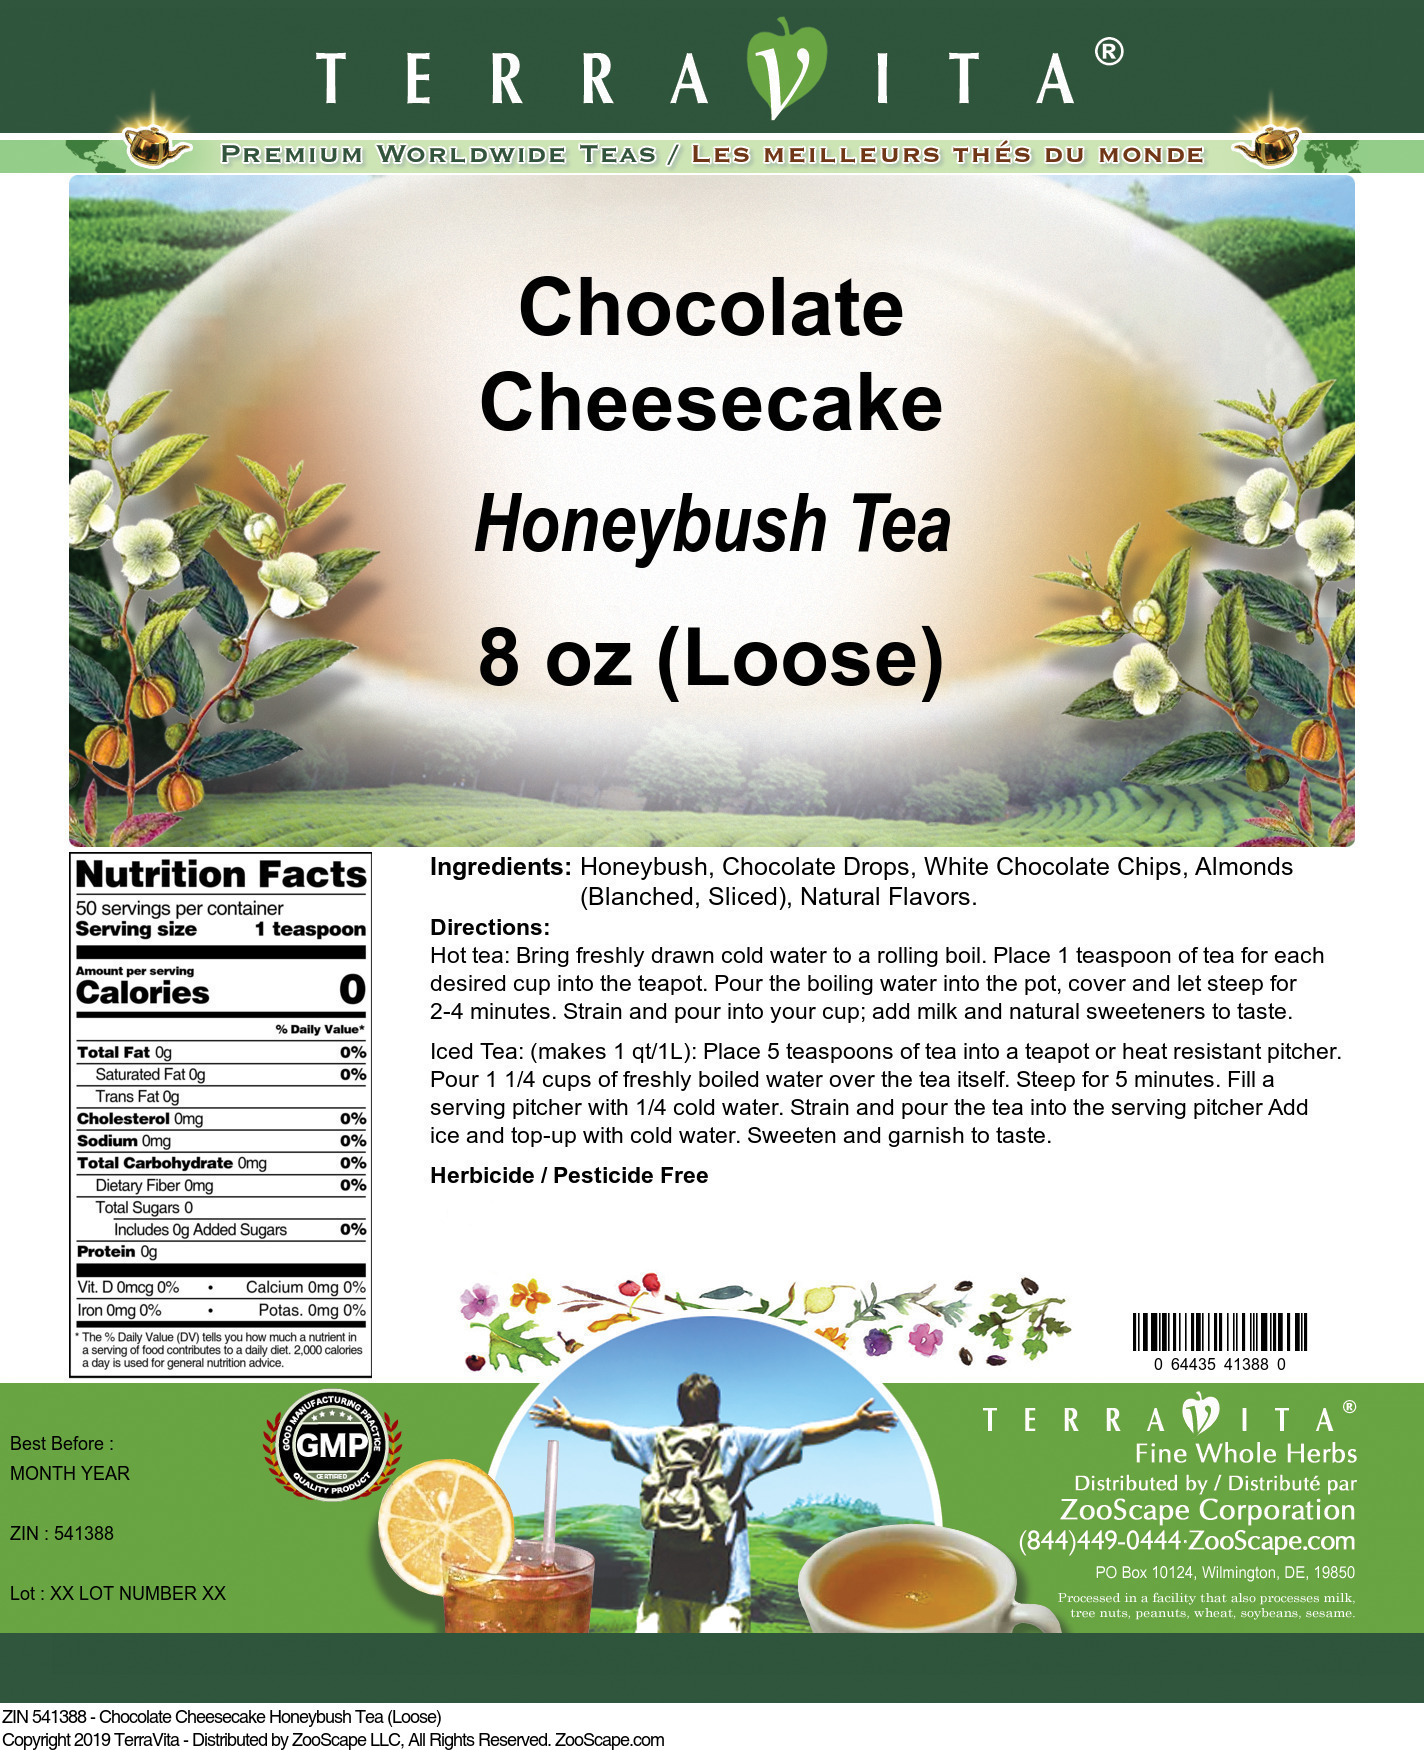 Chocolate Cheesecake Honeybush Tea (Loose)